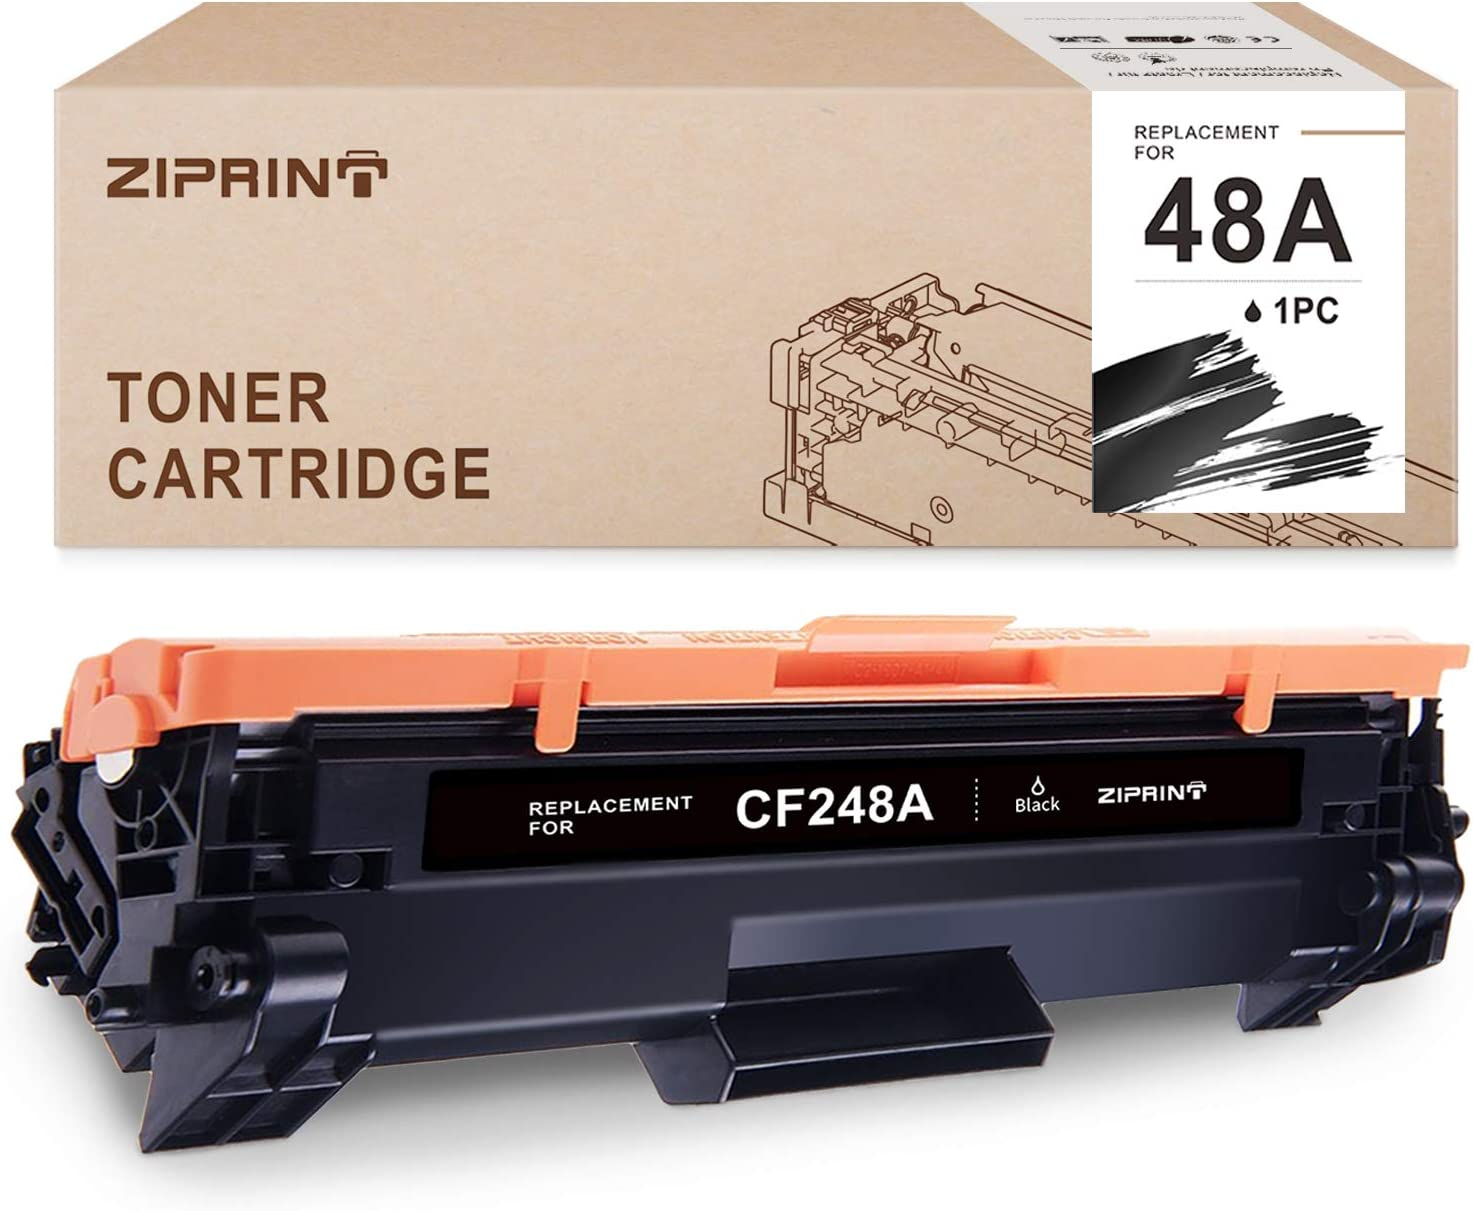 ZIPRINT Compatible Toner Cartridge Replacement for HP 48A CF248A for HP Laserjet Pro M16 M15 M31w HP Laserjet Pro MFP M28 M29 Prnter (Black, 1-Pack)